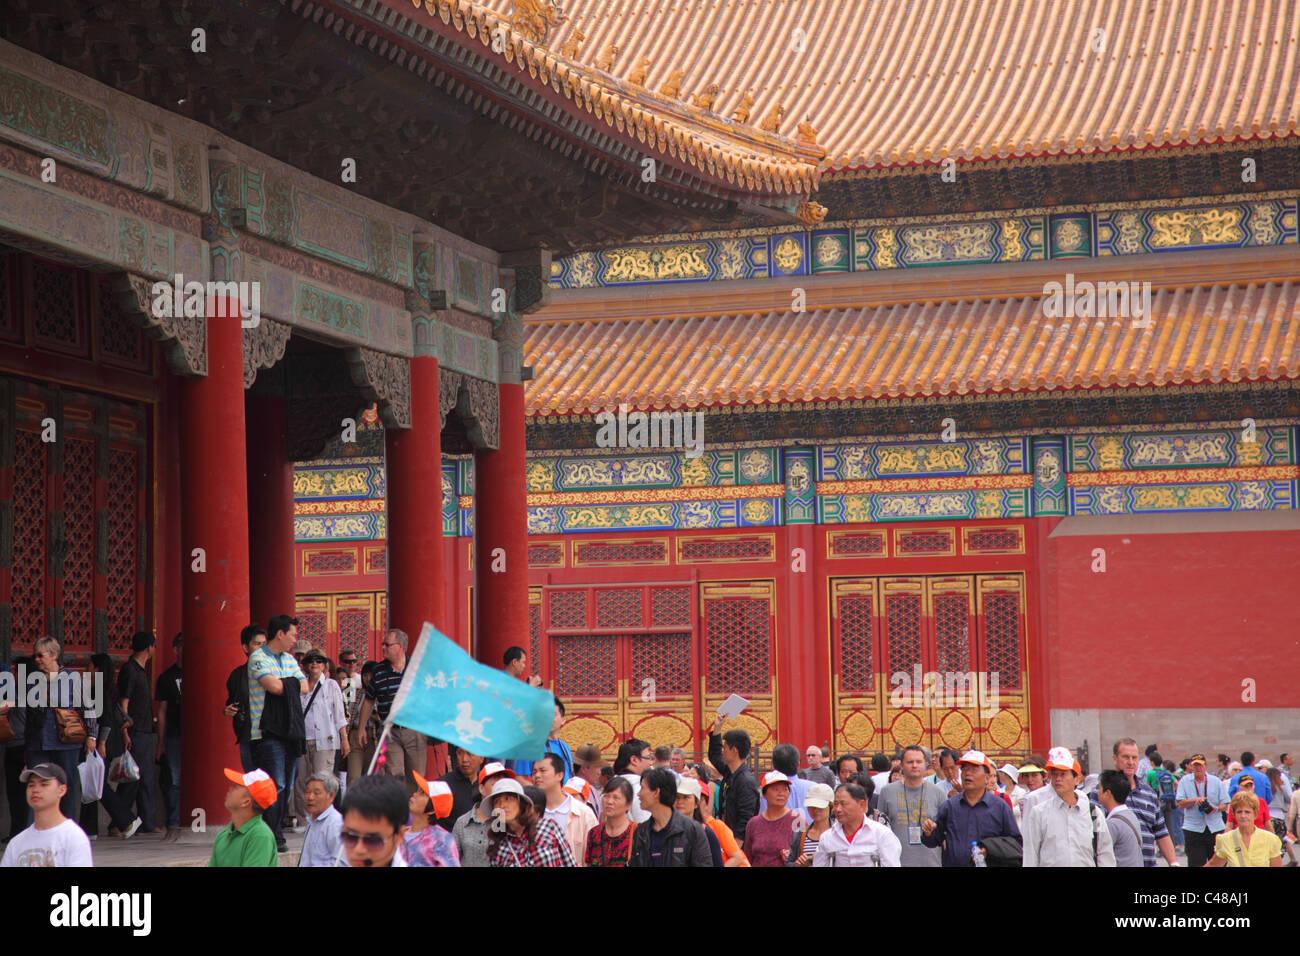 Forbidden City, Beijing, China - Stock Image